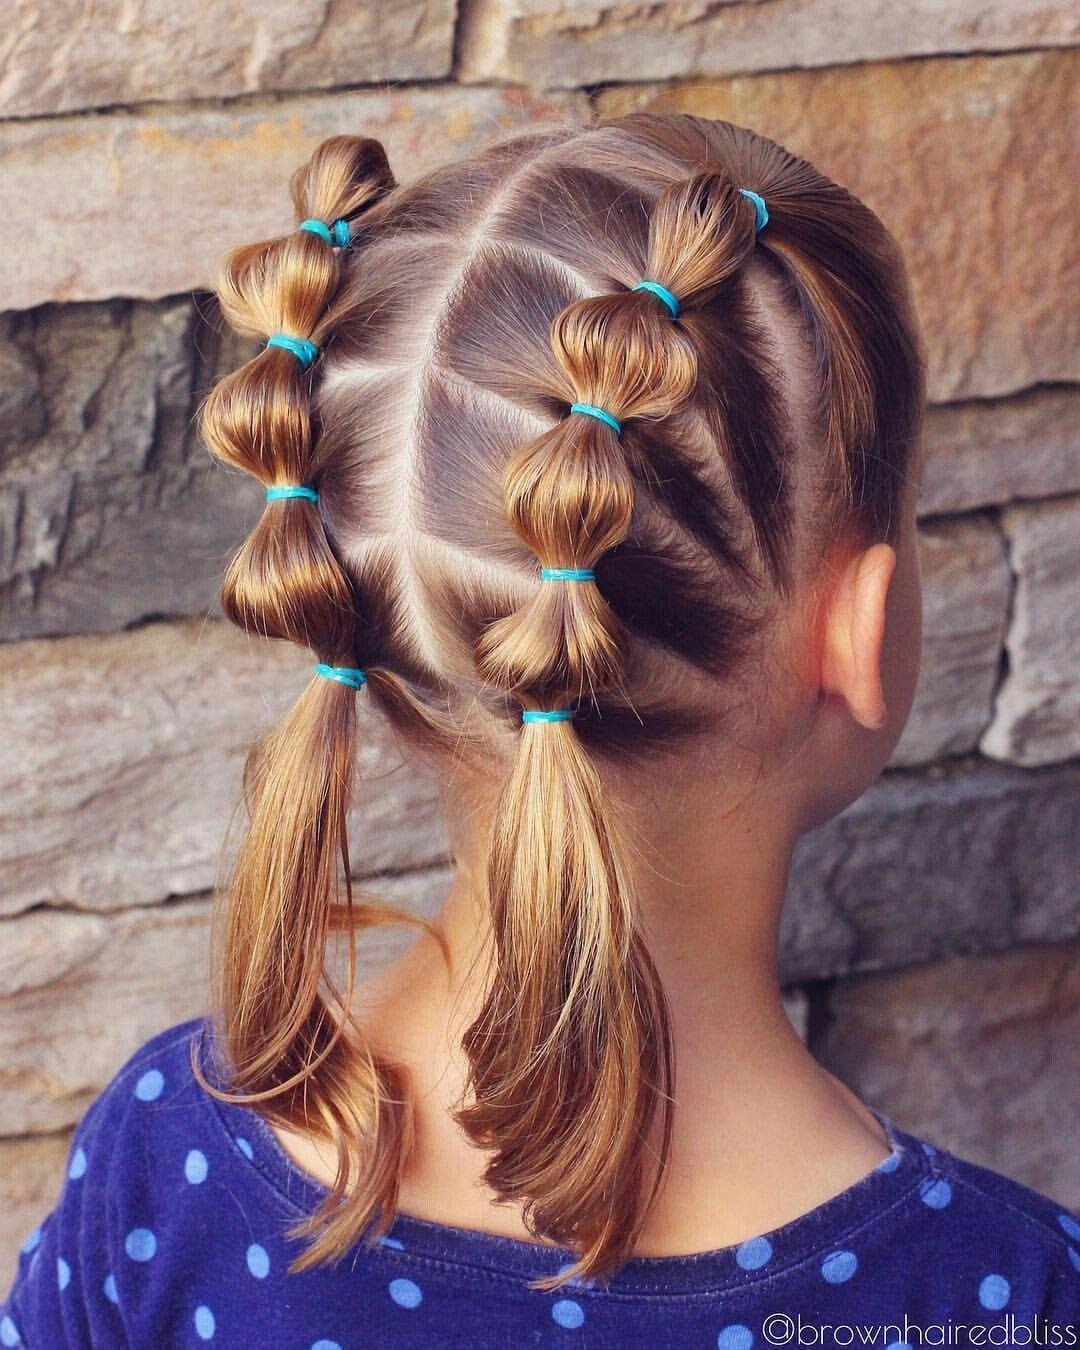 26 Child Long Hairstyles Trending On Pinterest Kucuk Kiz Sac